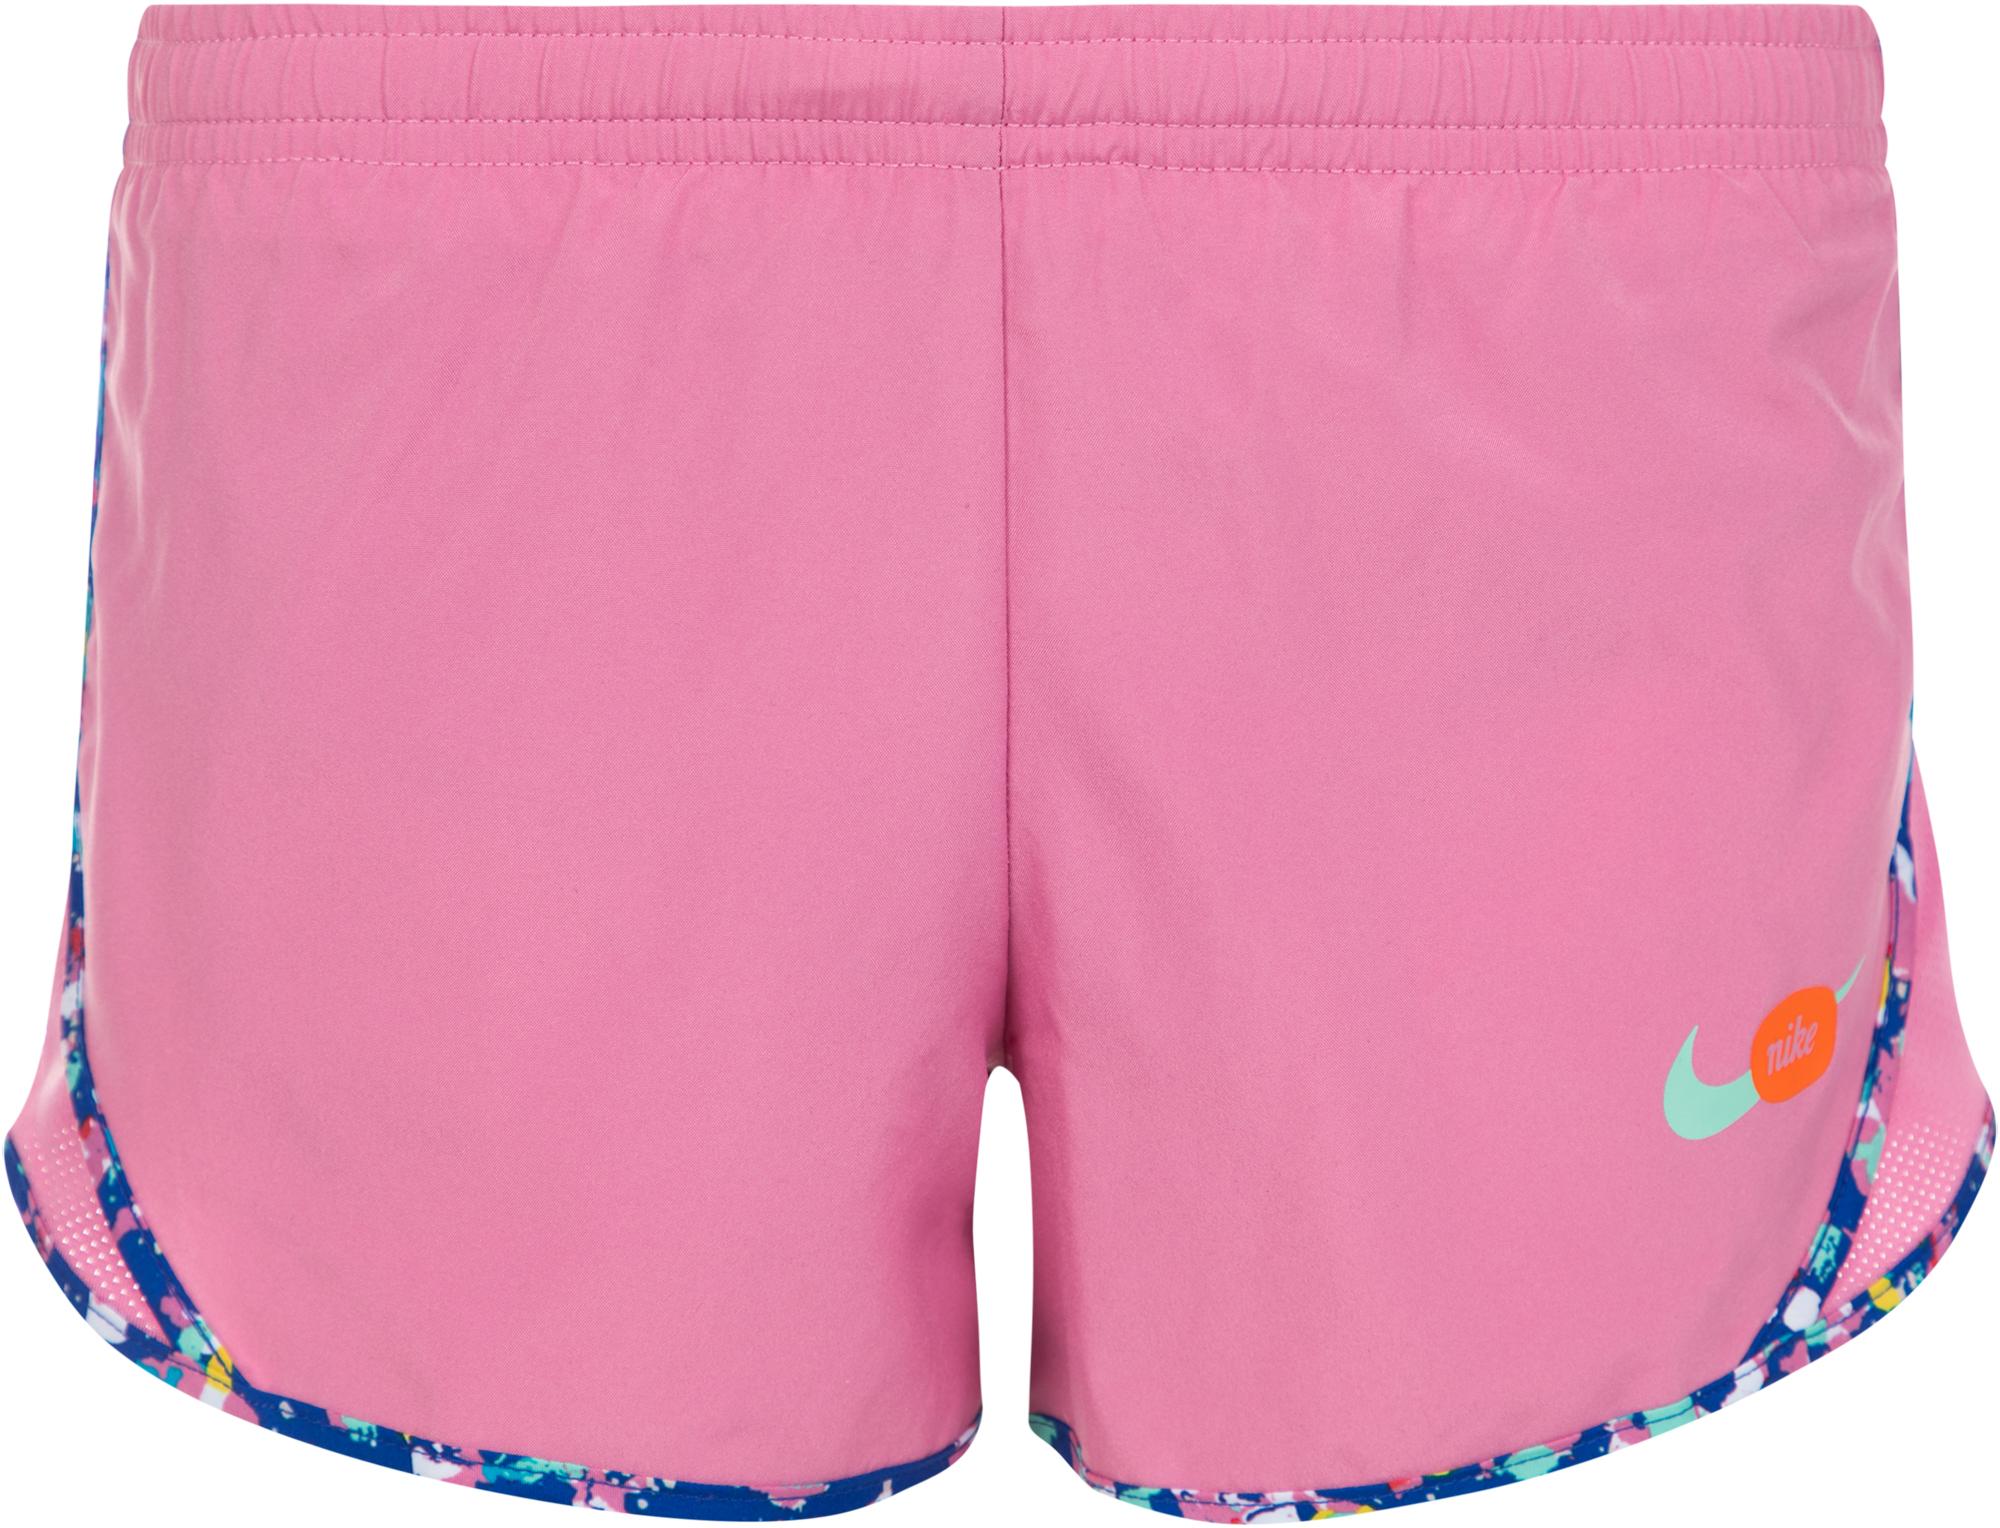 цена на Nike Шорты для девочек Nike Dri-FIT Tempo, размер 156-165